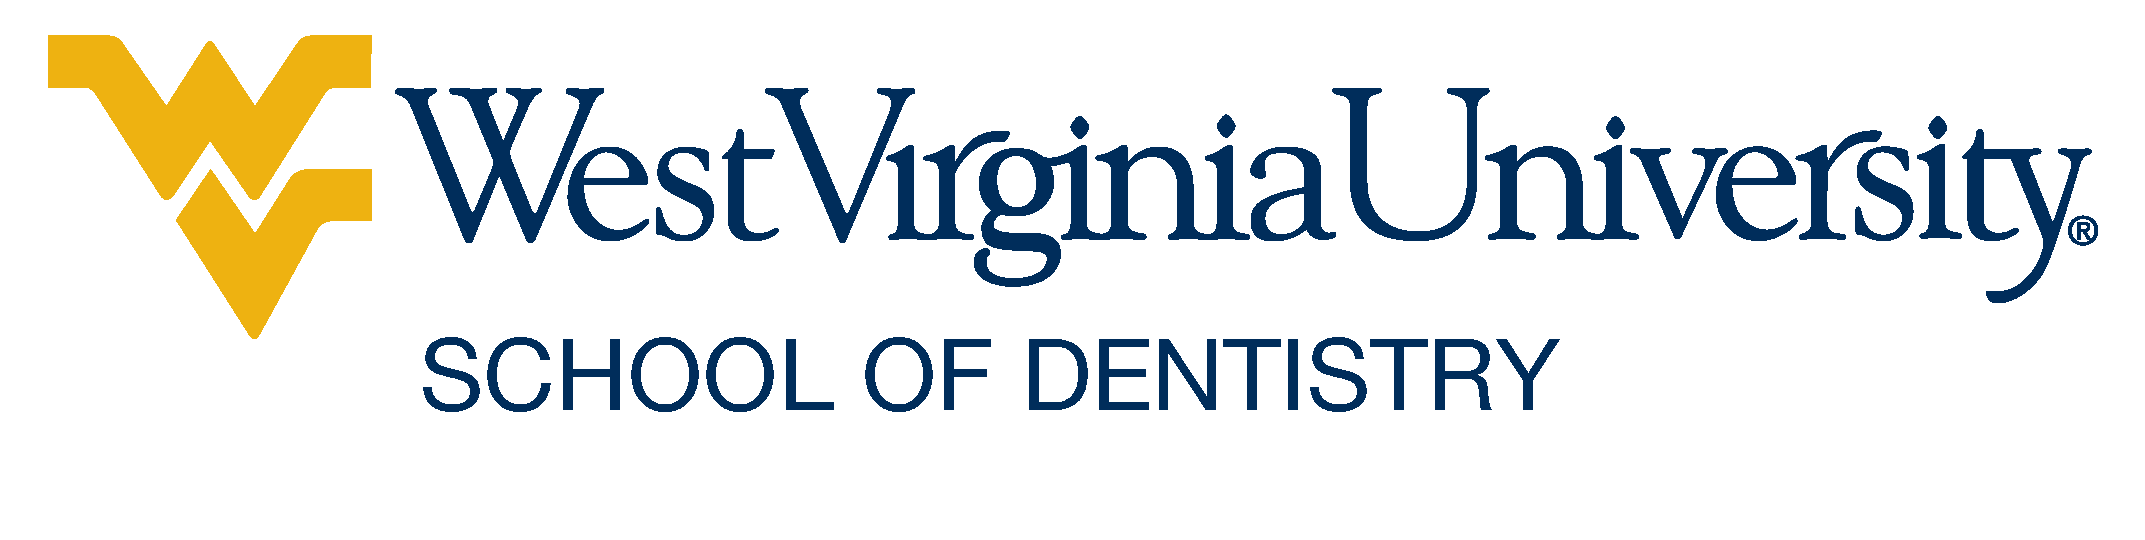 West Virginia Academy of Pediatric Dentistry